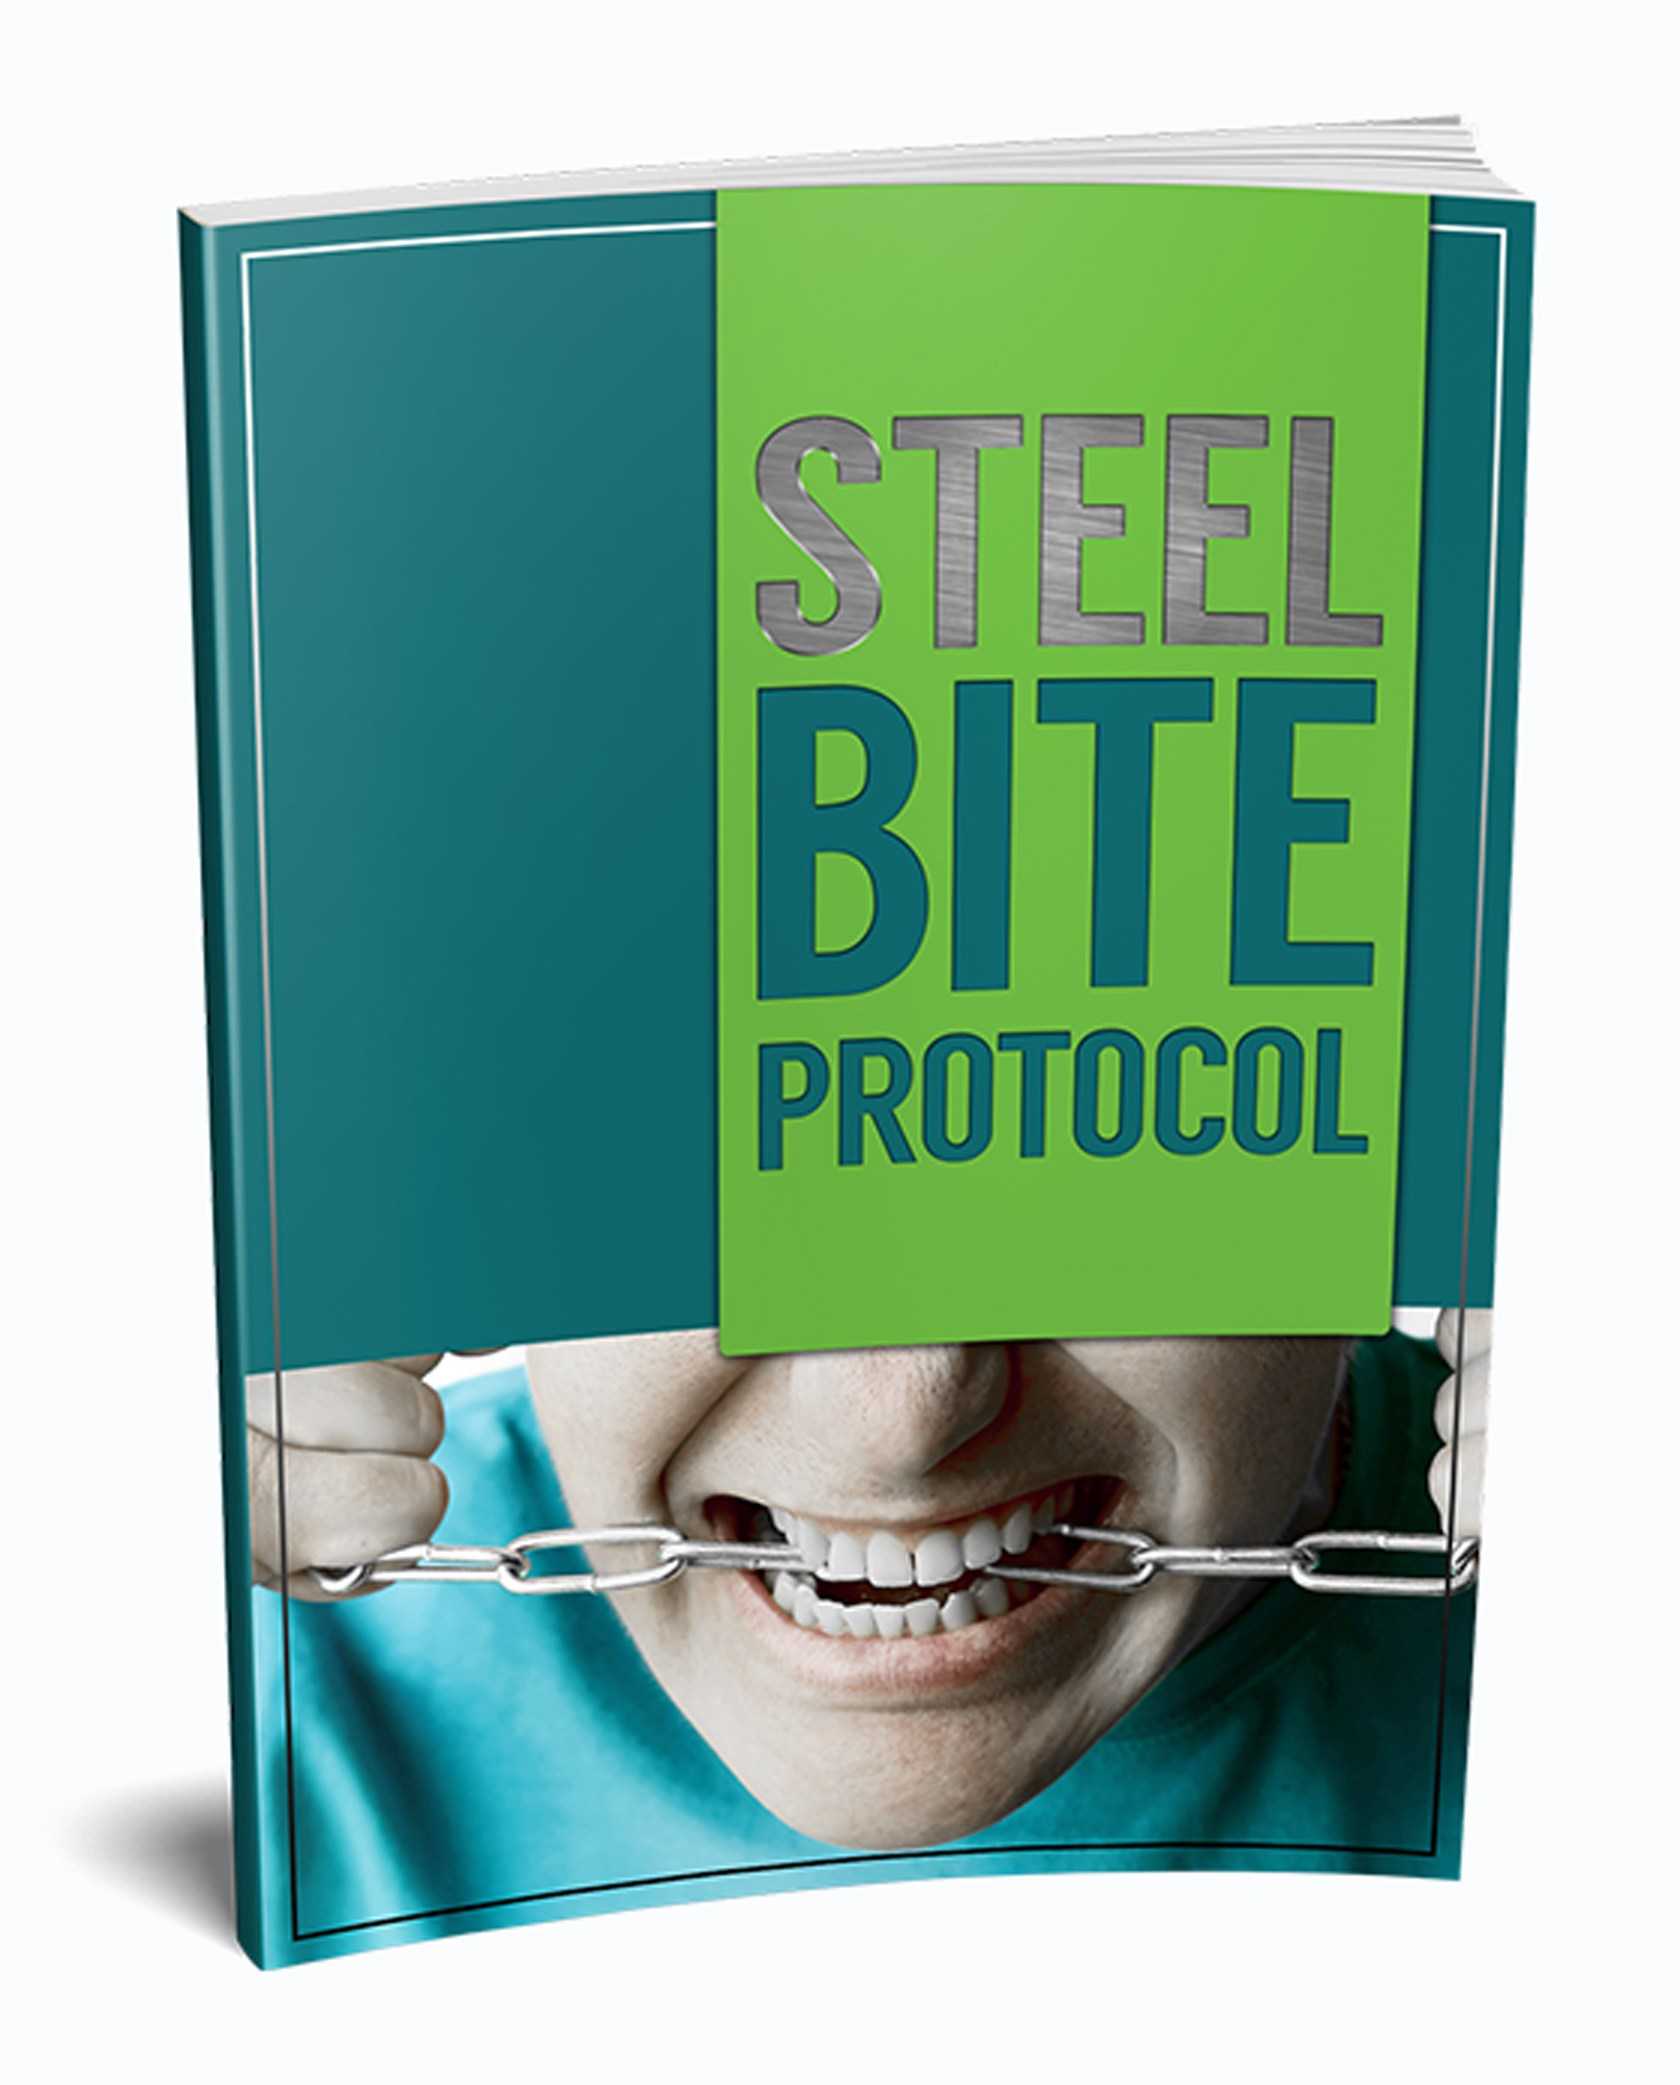 Steel-Bite-Protocol-review